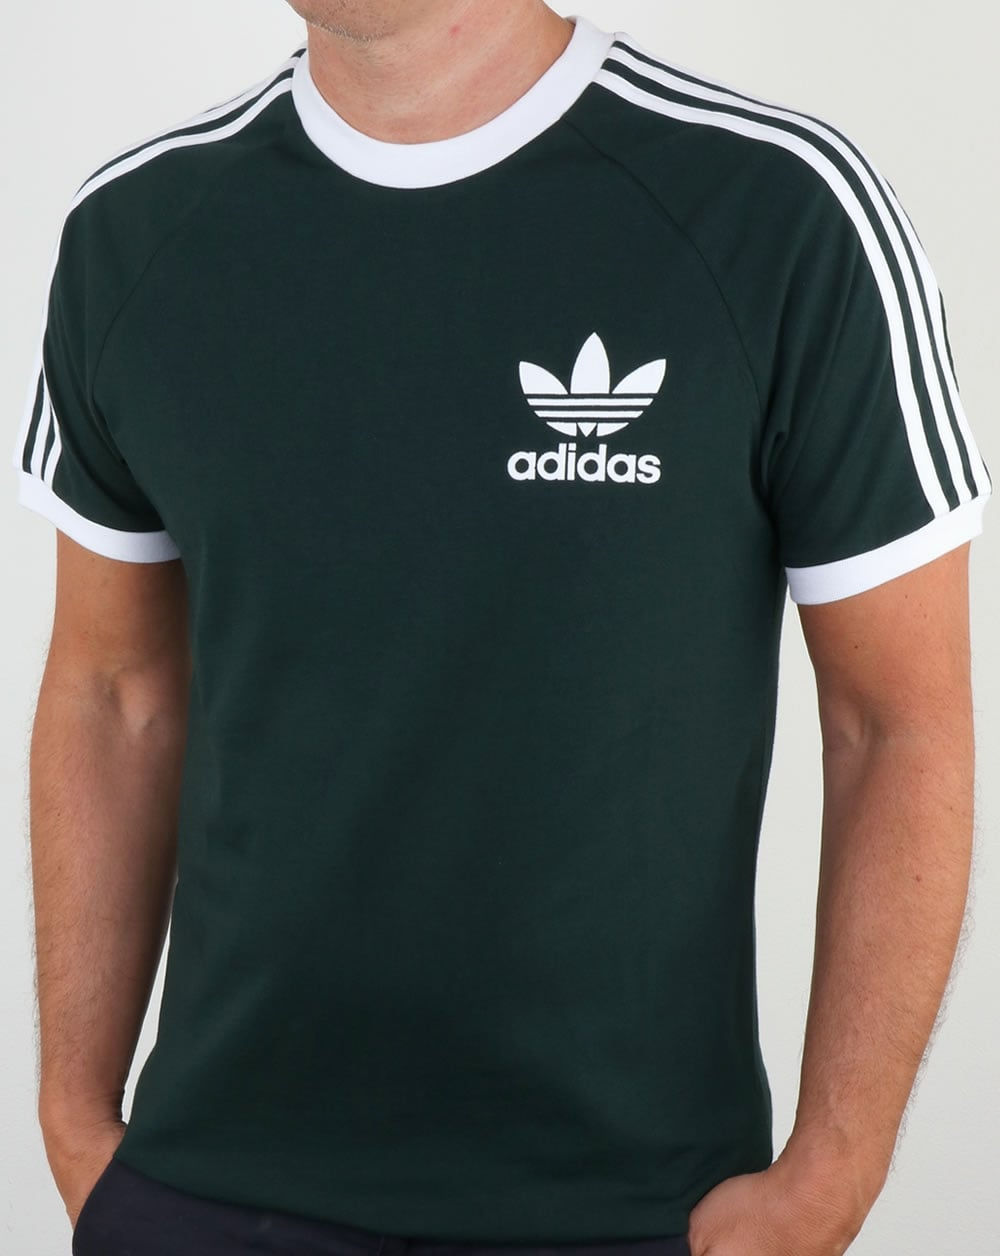 9119c9d1c2b adidas Originals Adidas Originals 3 Stripes T Shirt Green Night